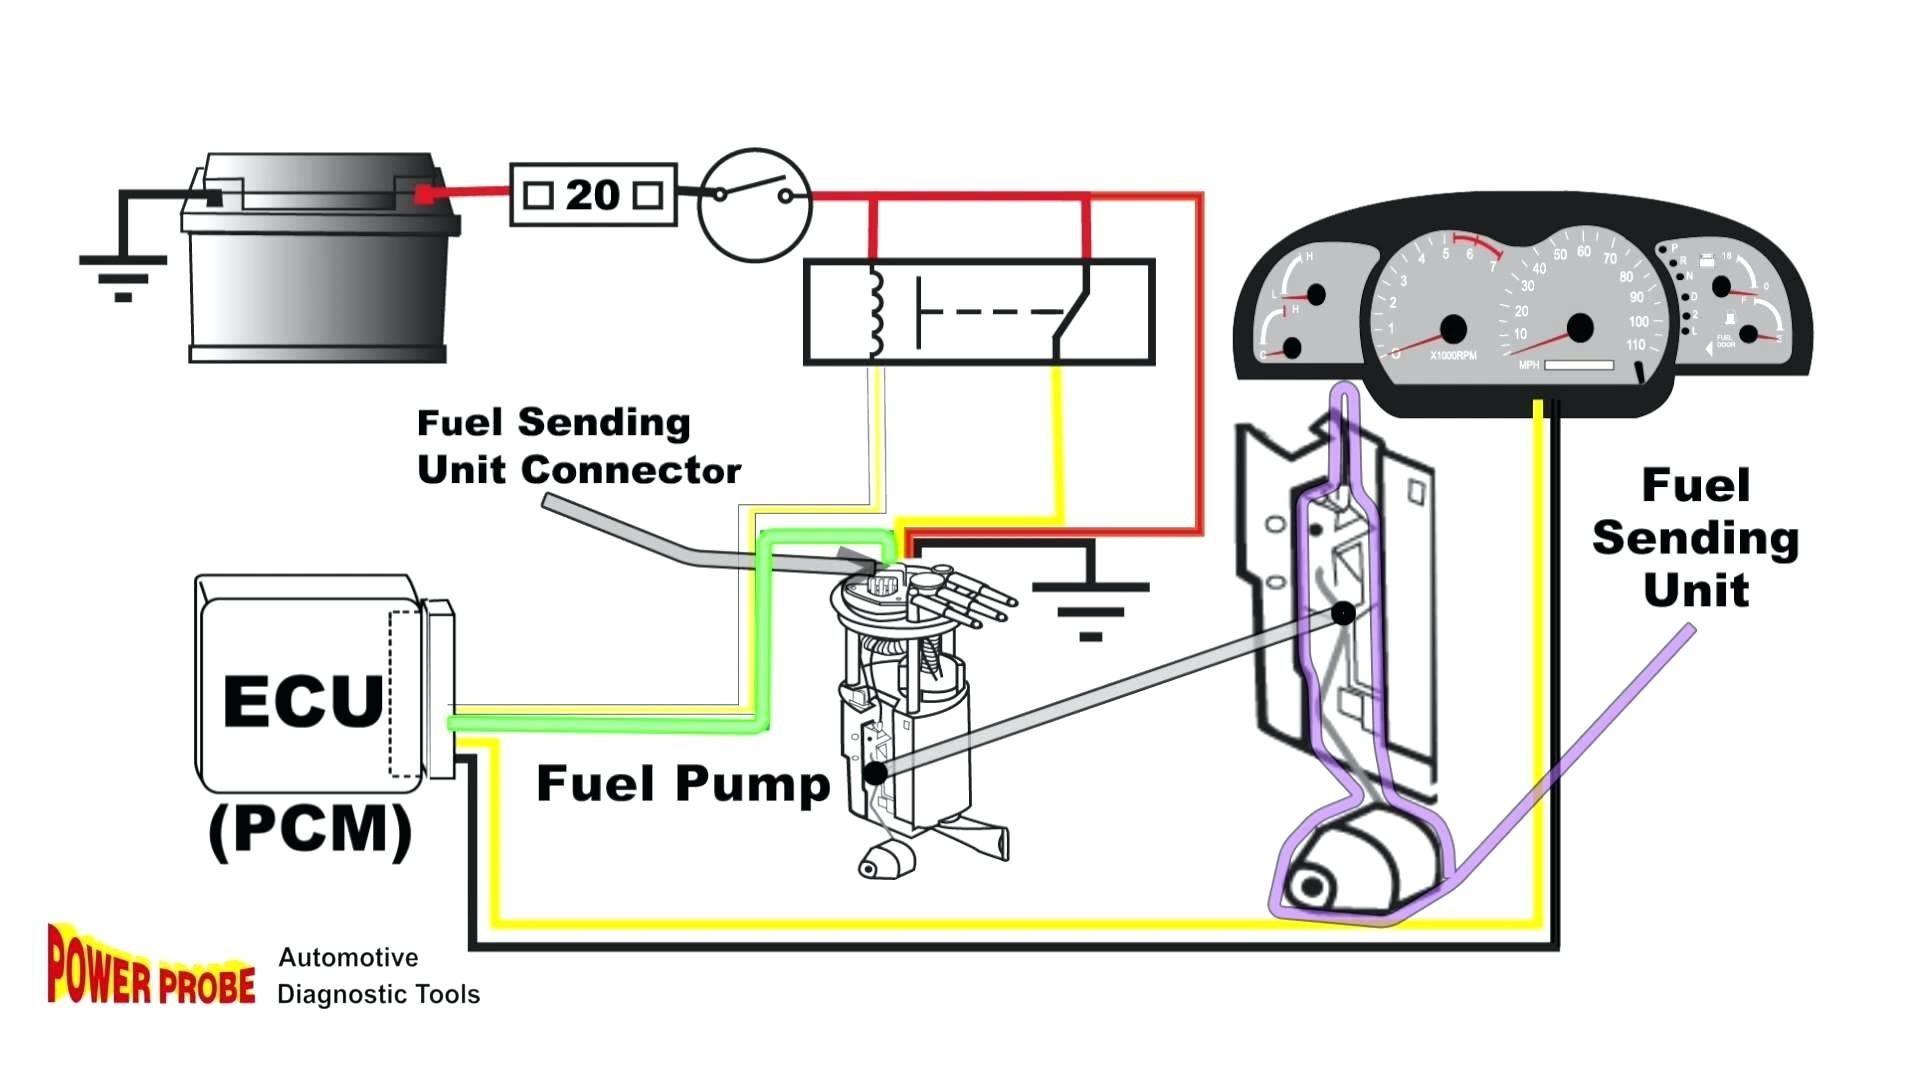 1973 glastron wiring diagram zn 1732  fuel sending unit wiring free download wiring diagram  zn 1732  fuel sending unit wiring free